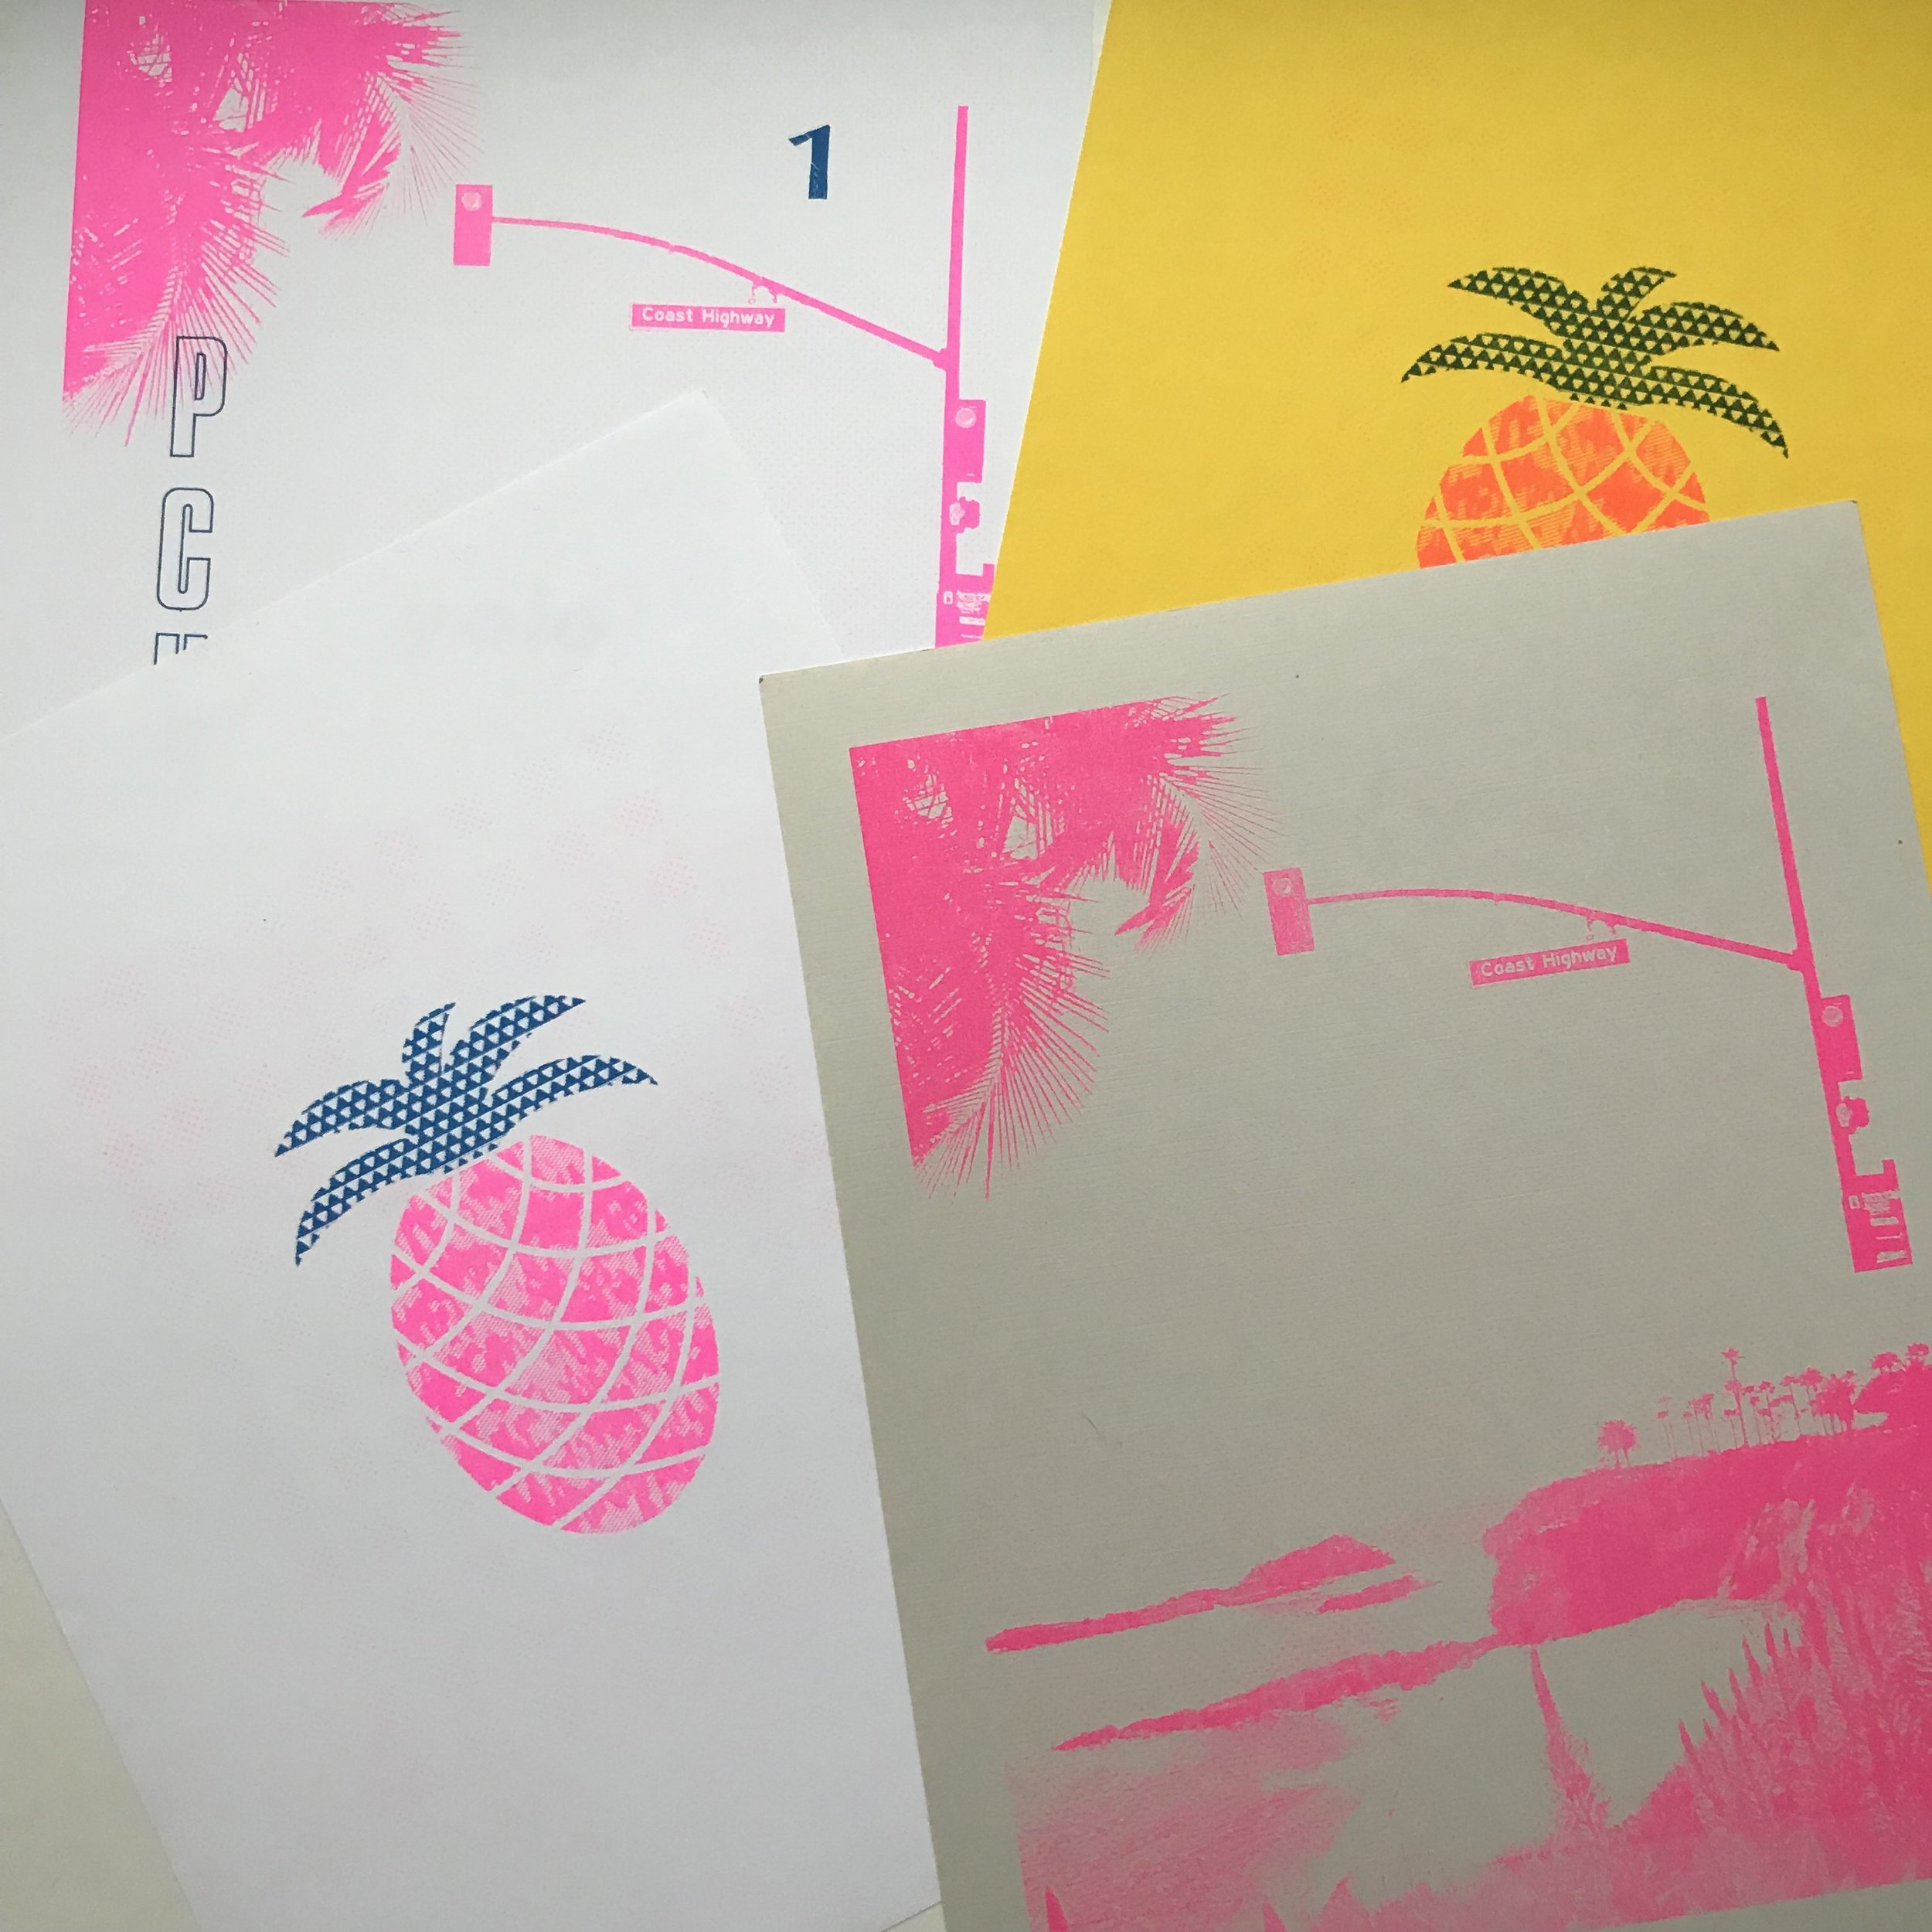 Risograph_Prints_JessicaLyons.jpg